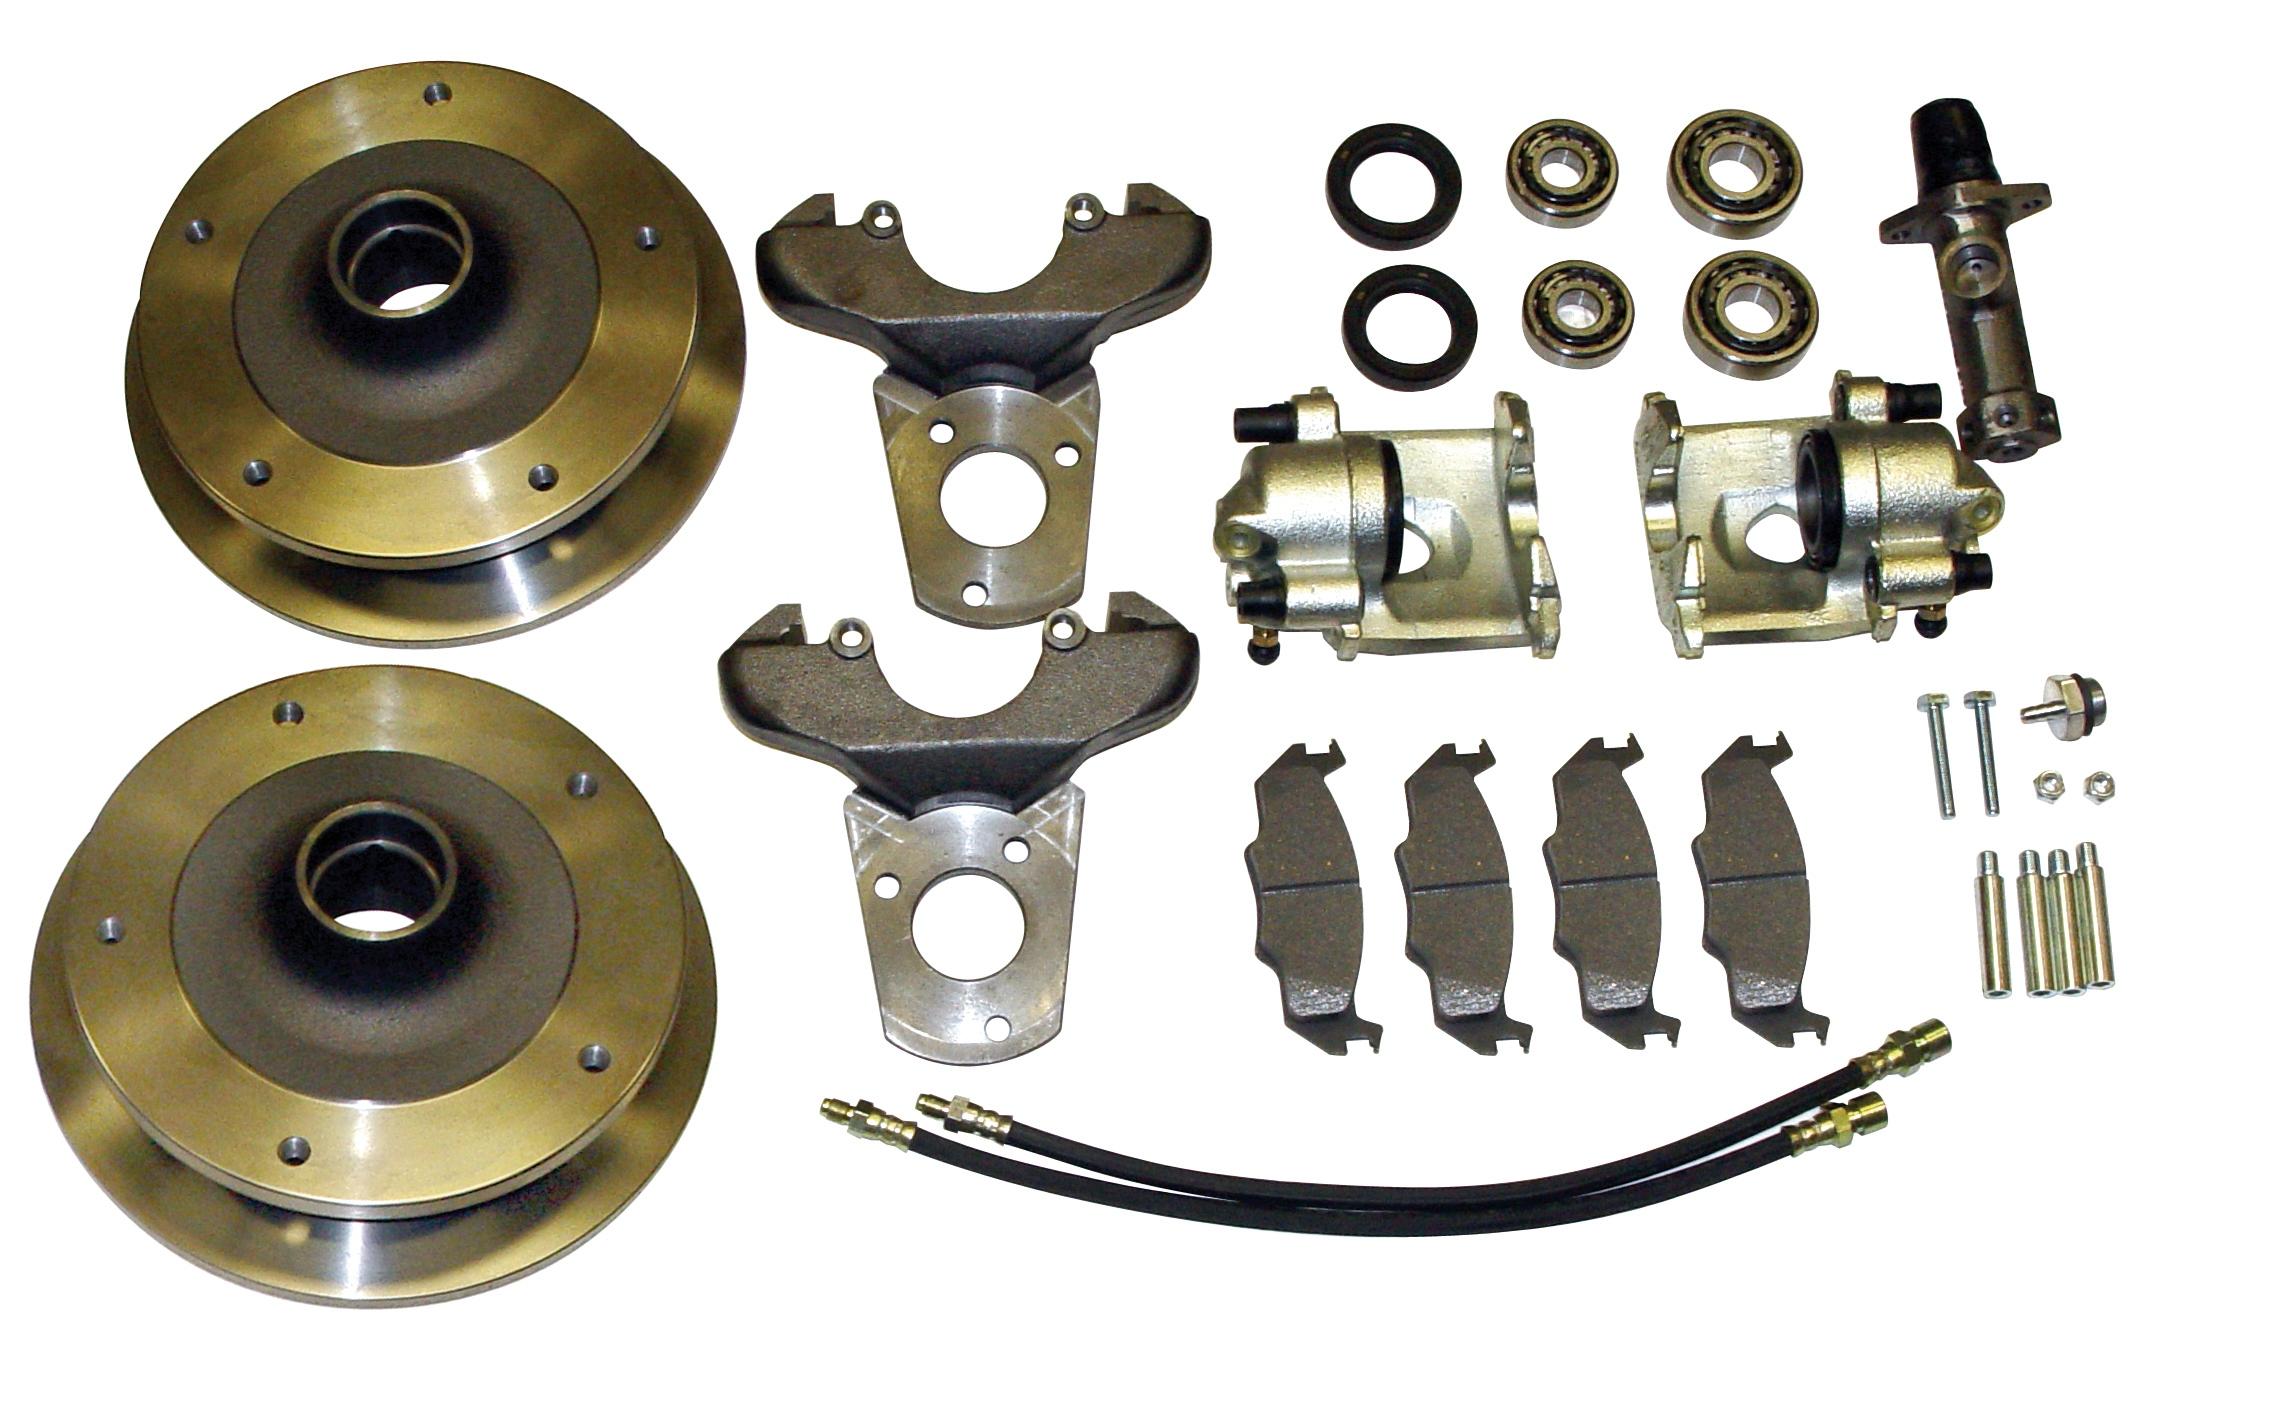 Rear disc brake conversion kit for 68-79 4 lug VW Volkswagen without emergency